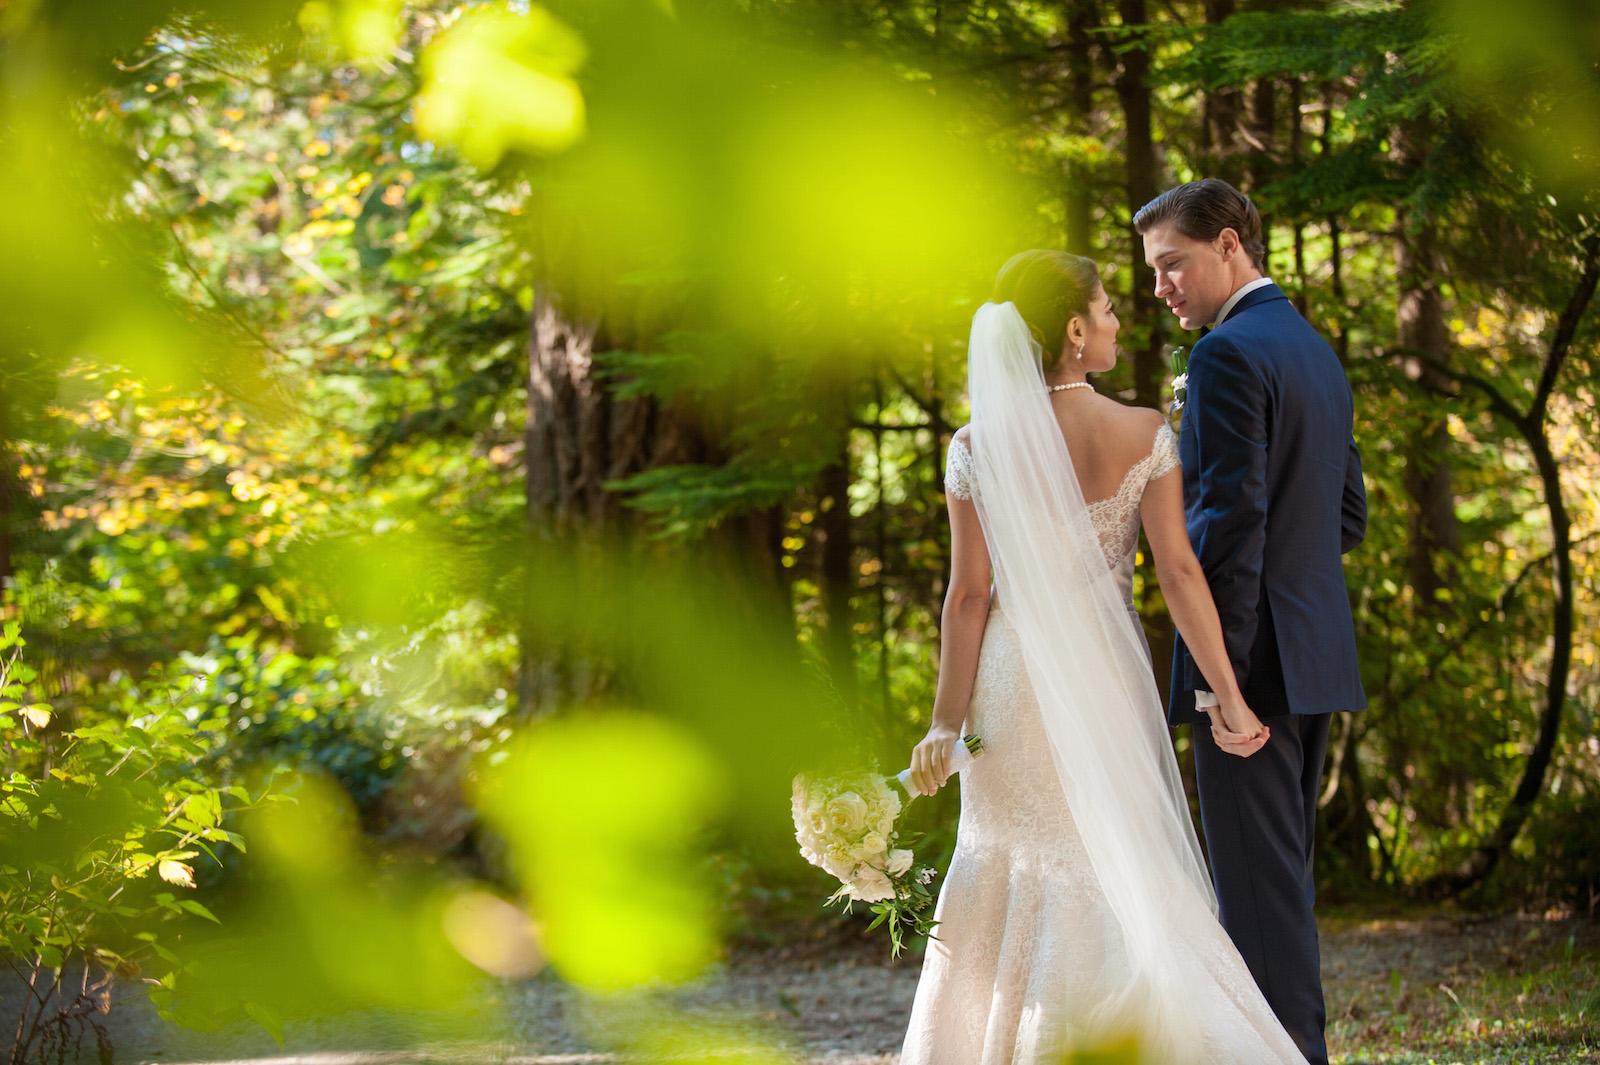 victoria-wedding-photographers-fairmont-pacific-rim-wedding-30.jpg